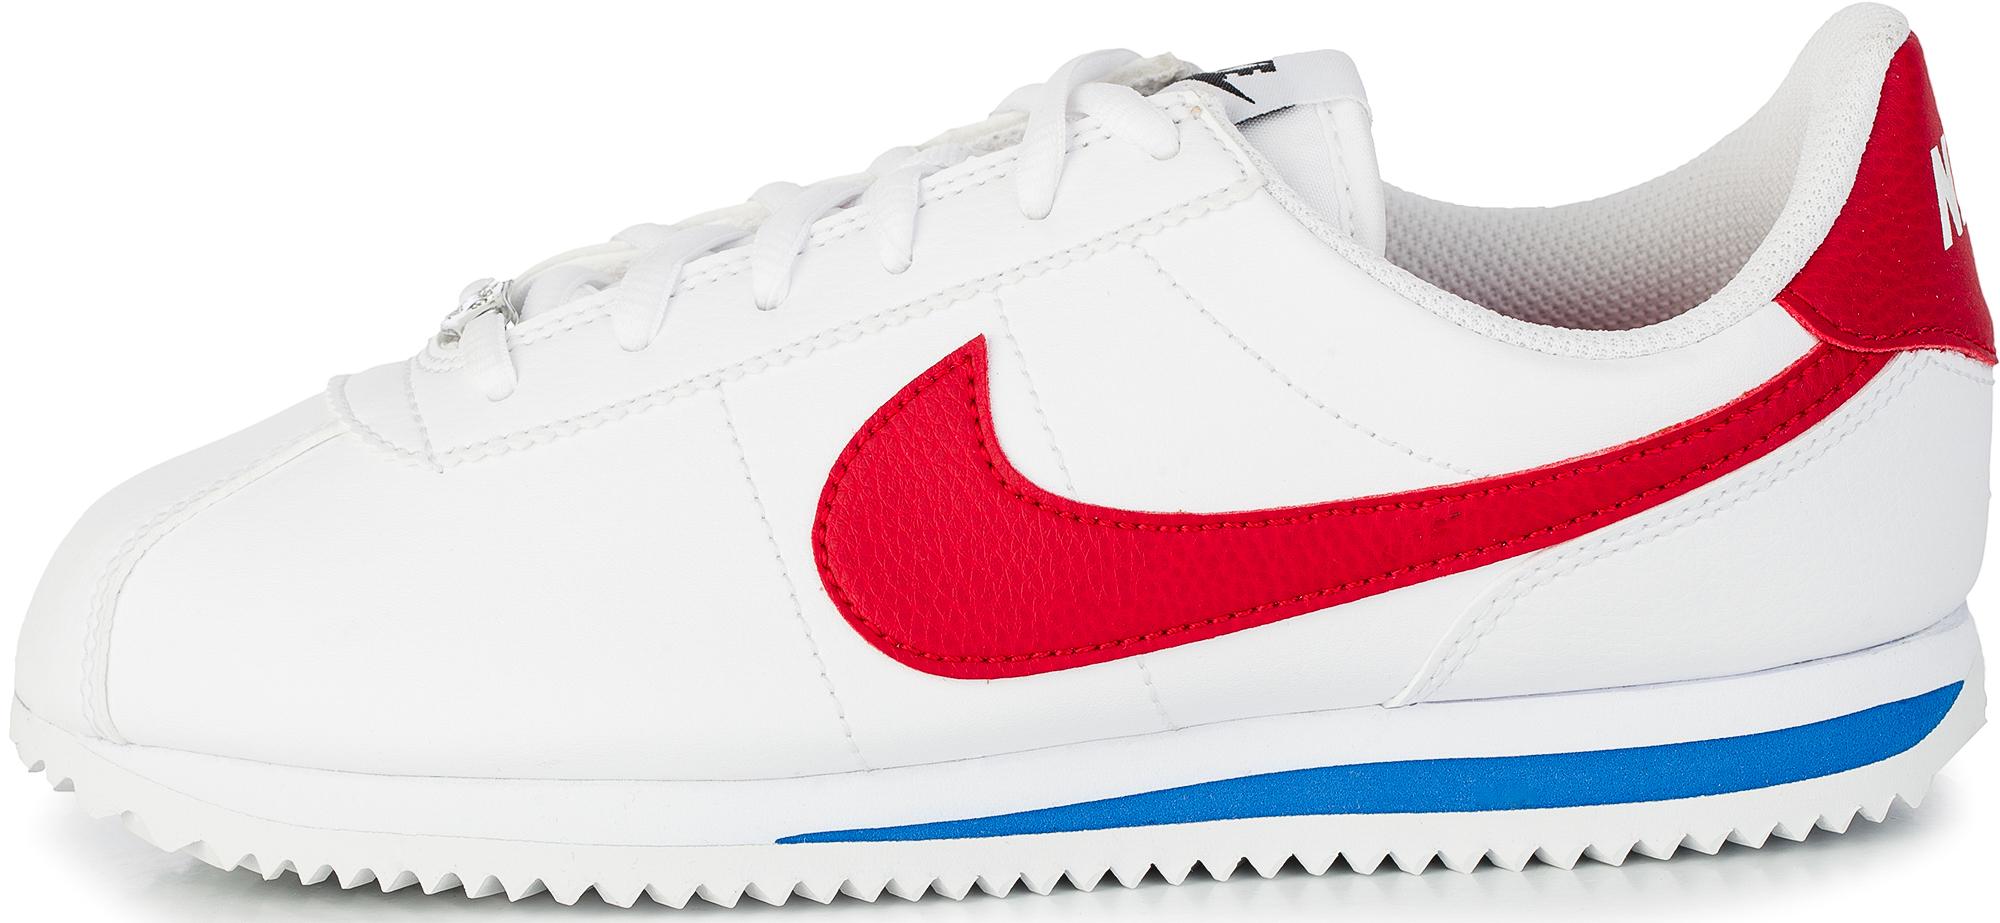 Nike Кроссовки детские Nike Cortez Basic SL, размер 37,5